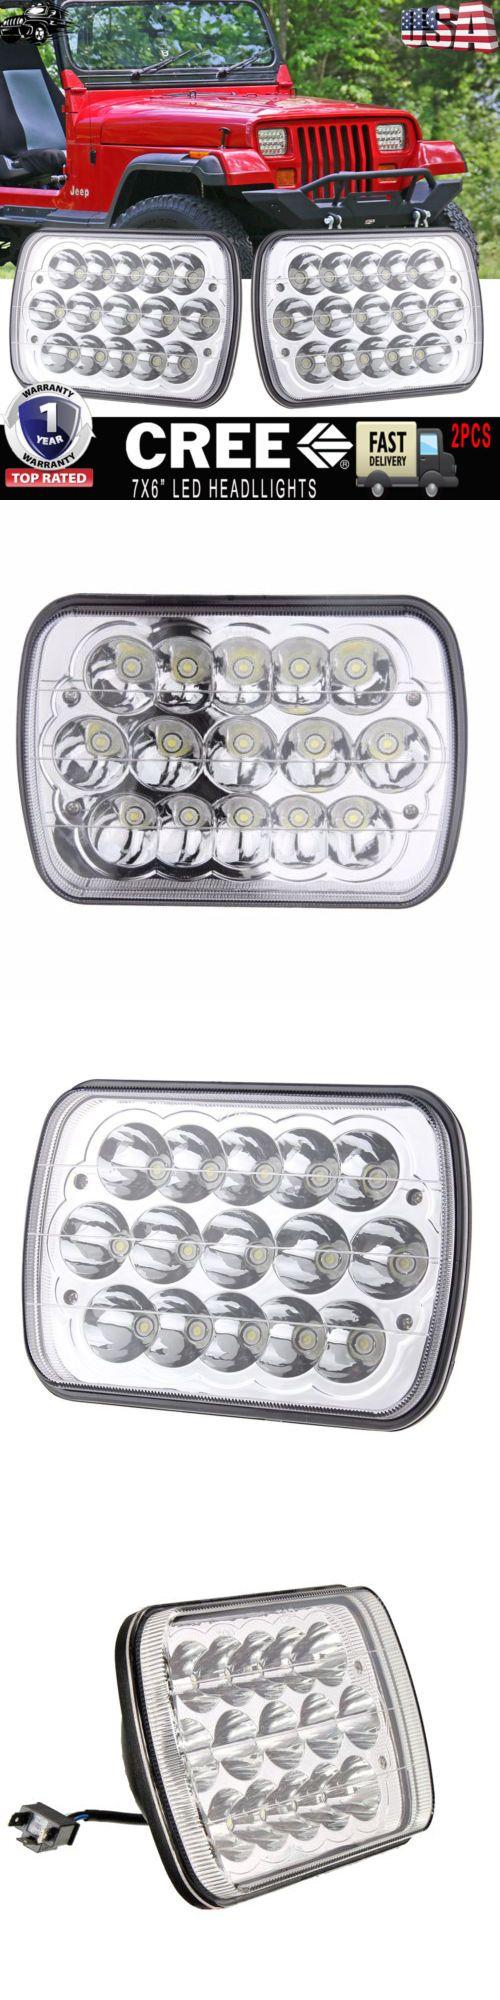 Car Lighting: 7X6 Led Sealed Beam Headlight H4656 4651 Upgrade Jeep Wrangler Yj 1987-1995 2Pc -> BUY IT NOW ONLY: $45.05 on eBay!